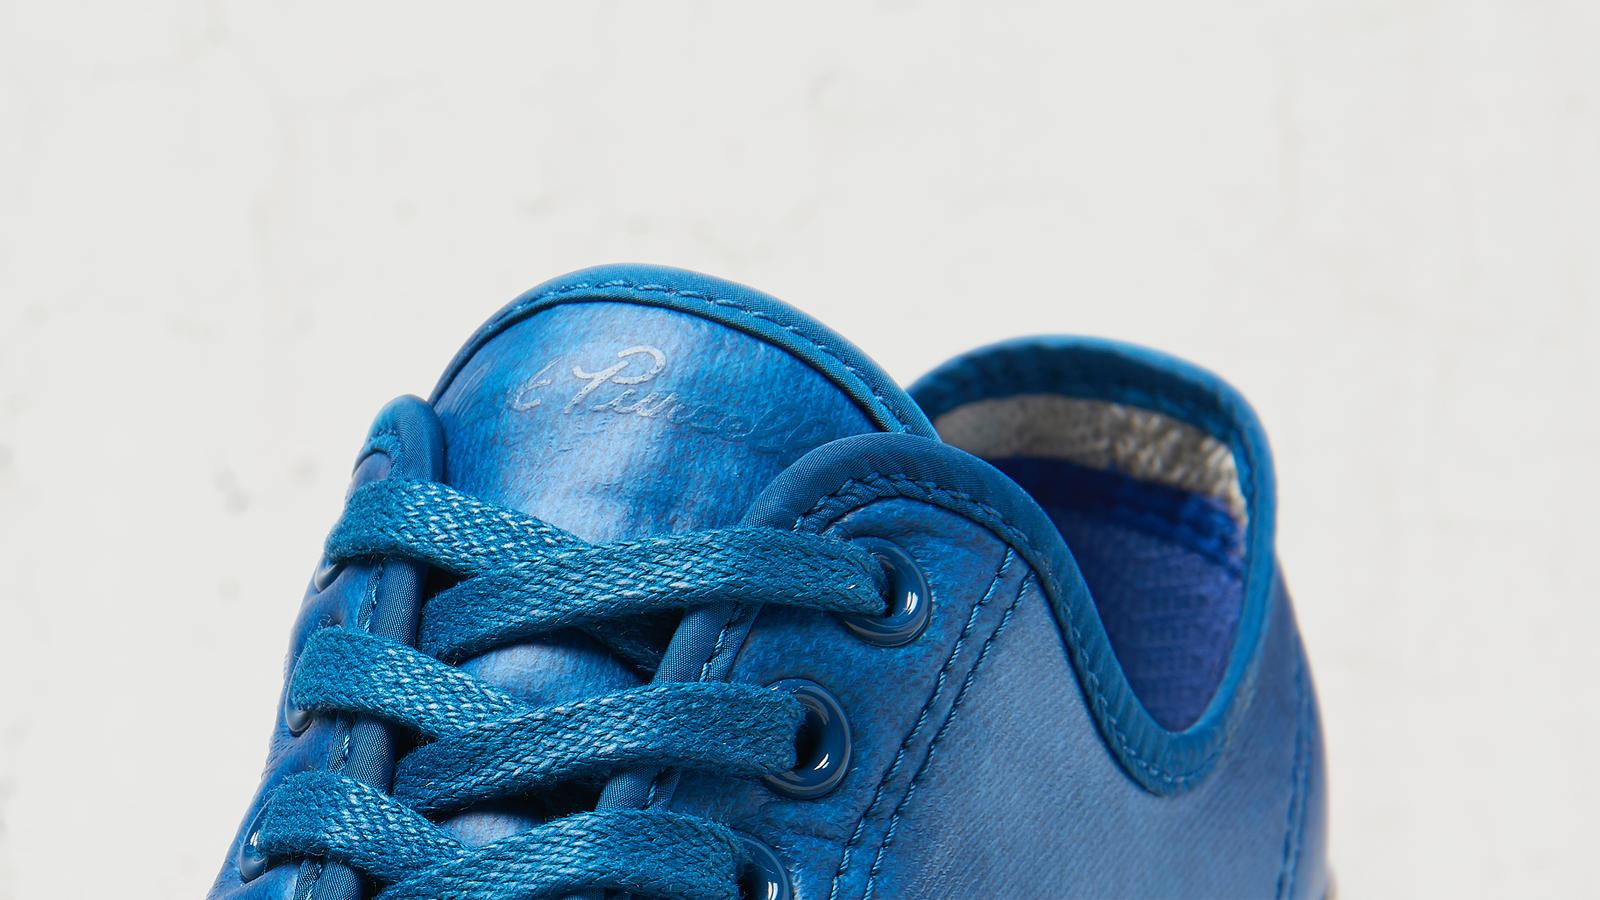 designer fashion 90469 eeef5 ... 160729 converse jp blue details 01 native 1600